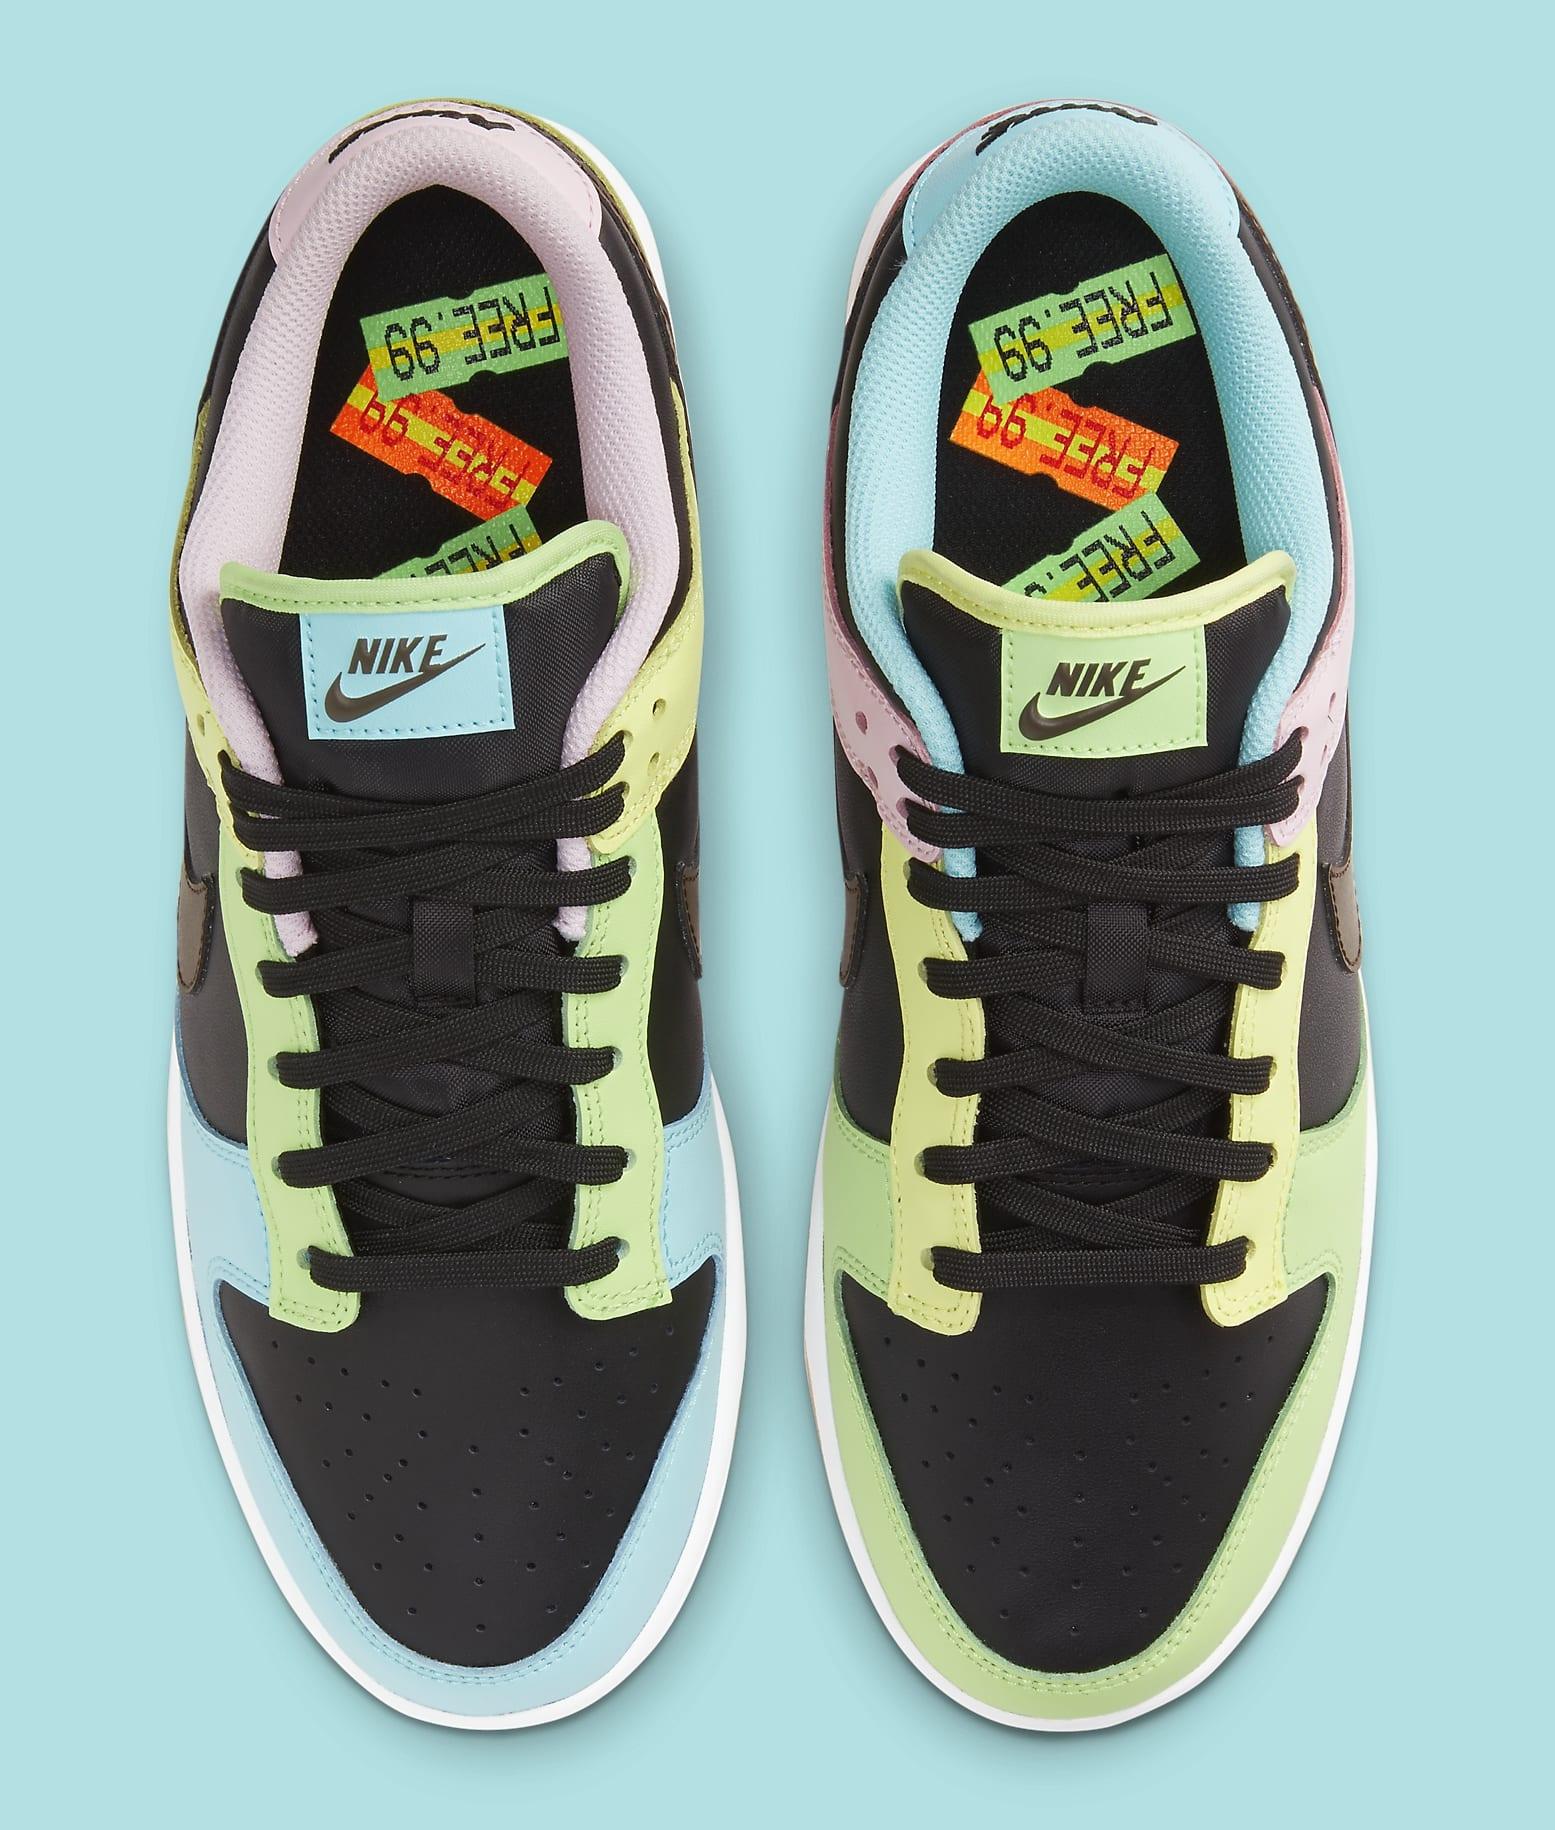 Nike Dunk Low 'Free.99' Black DH0952-001 Top